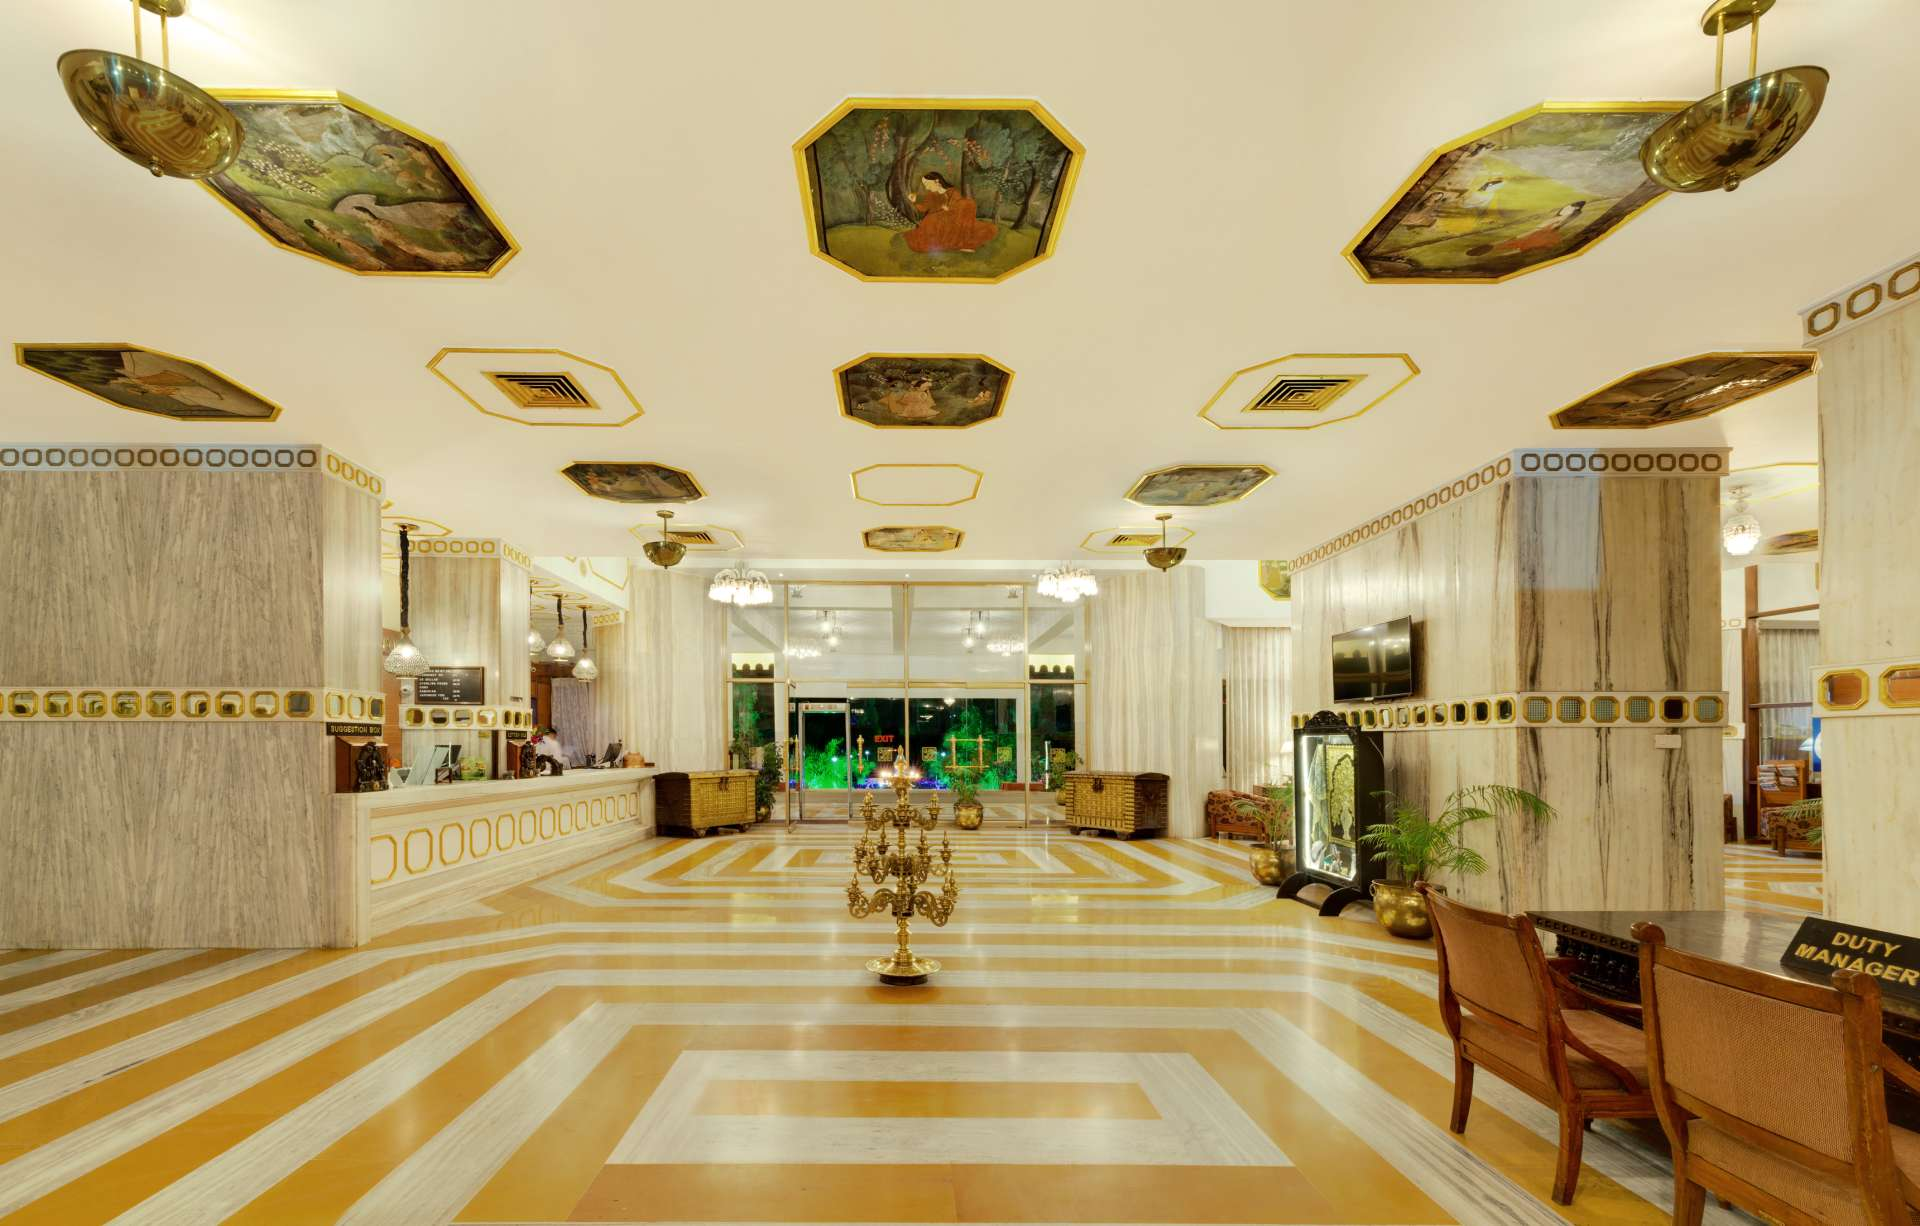 Lobby Aurangabad banner ambassador ajanta - The Ambassador | Heritage Hotels in Mumbai, Aurangabad, Chennai - Ambassador Ajanta Aurangabad